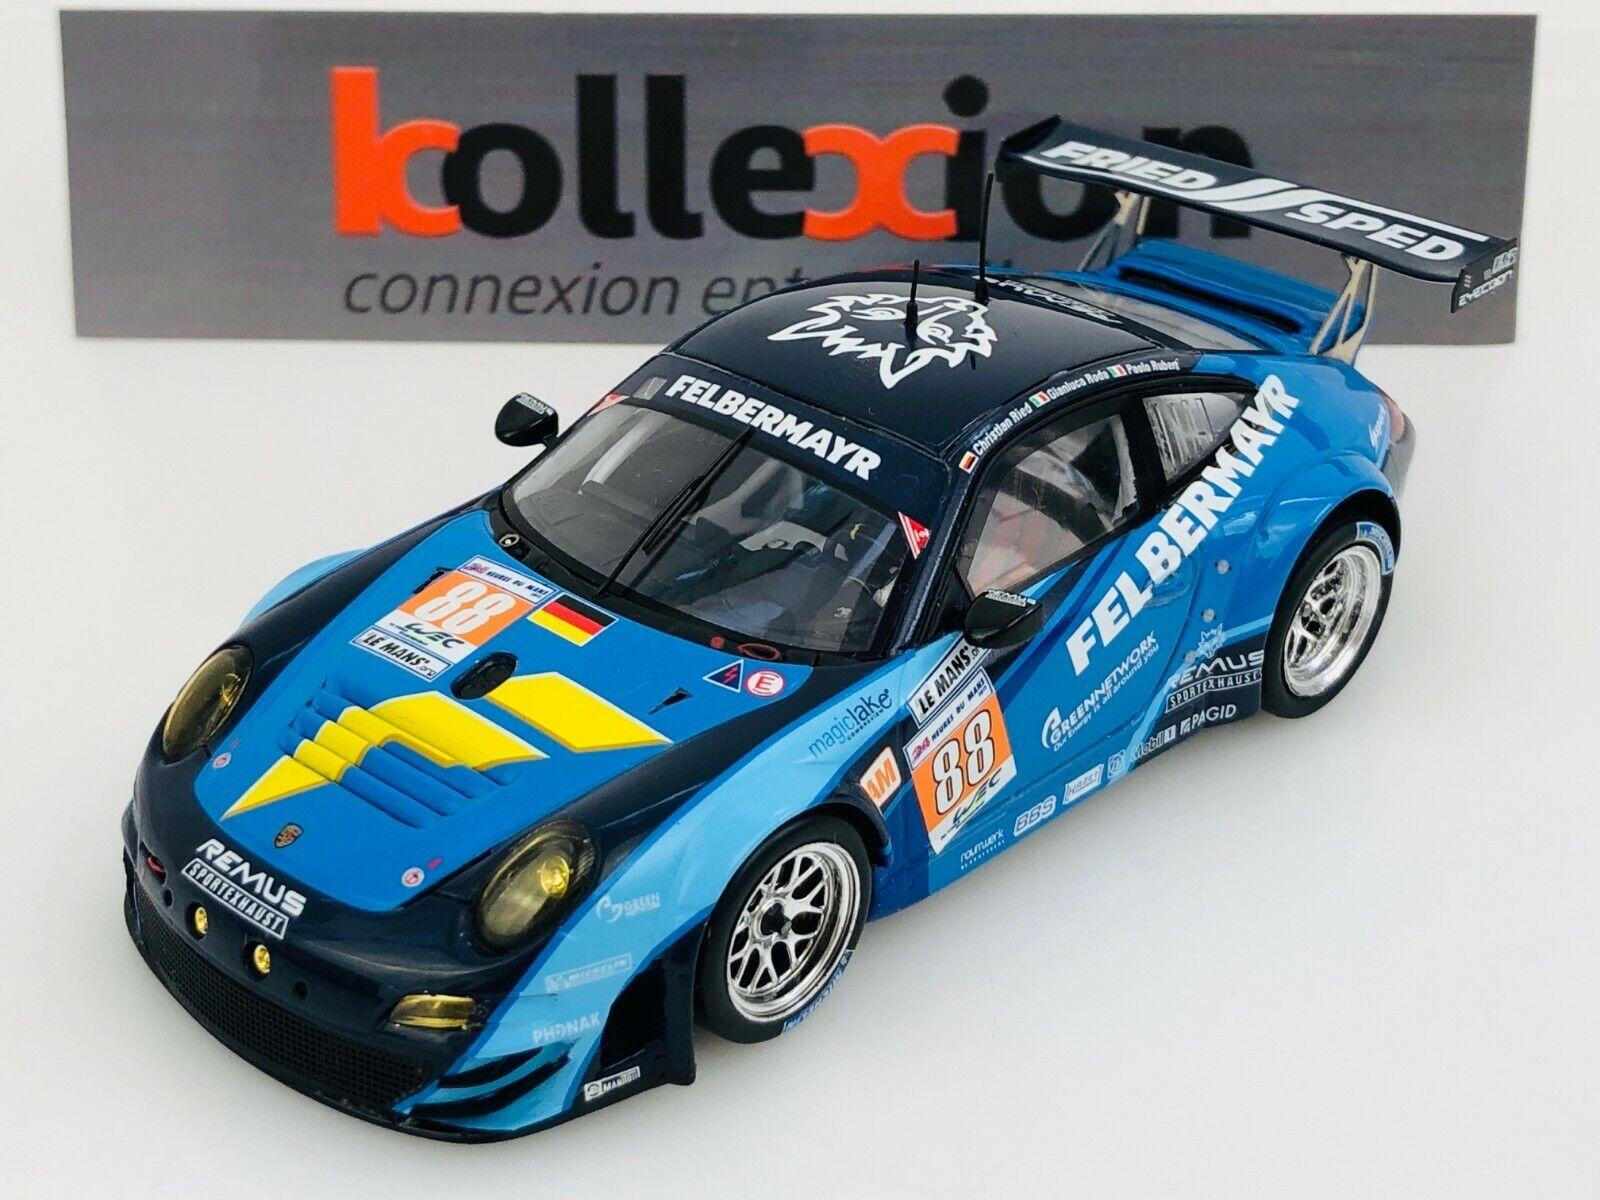 SPARK S3739 PORSCHE 997 RSR Felbermayr - Projoon n°88 Le Mans 2012 1.43 NB